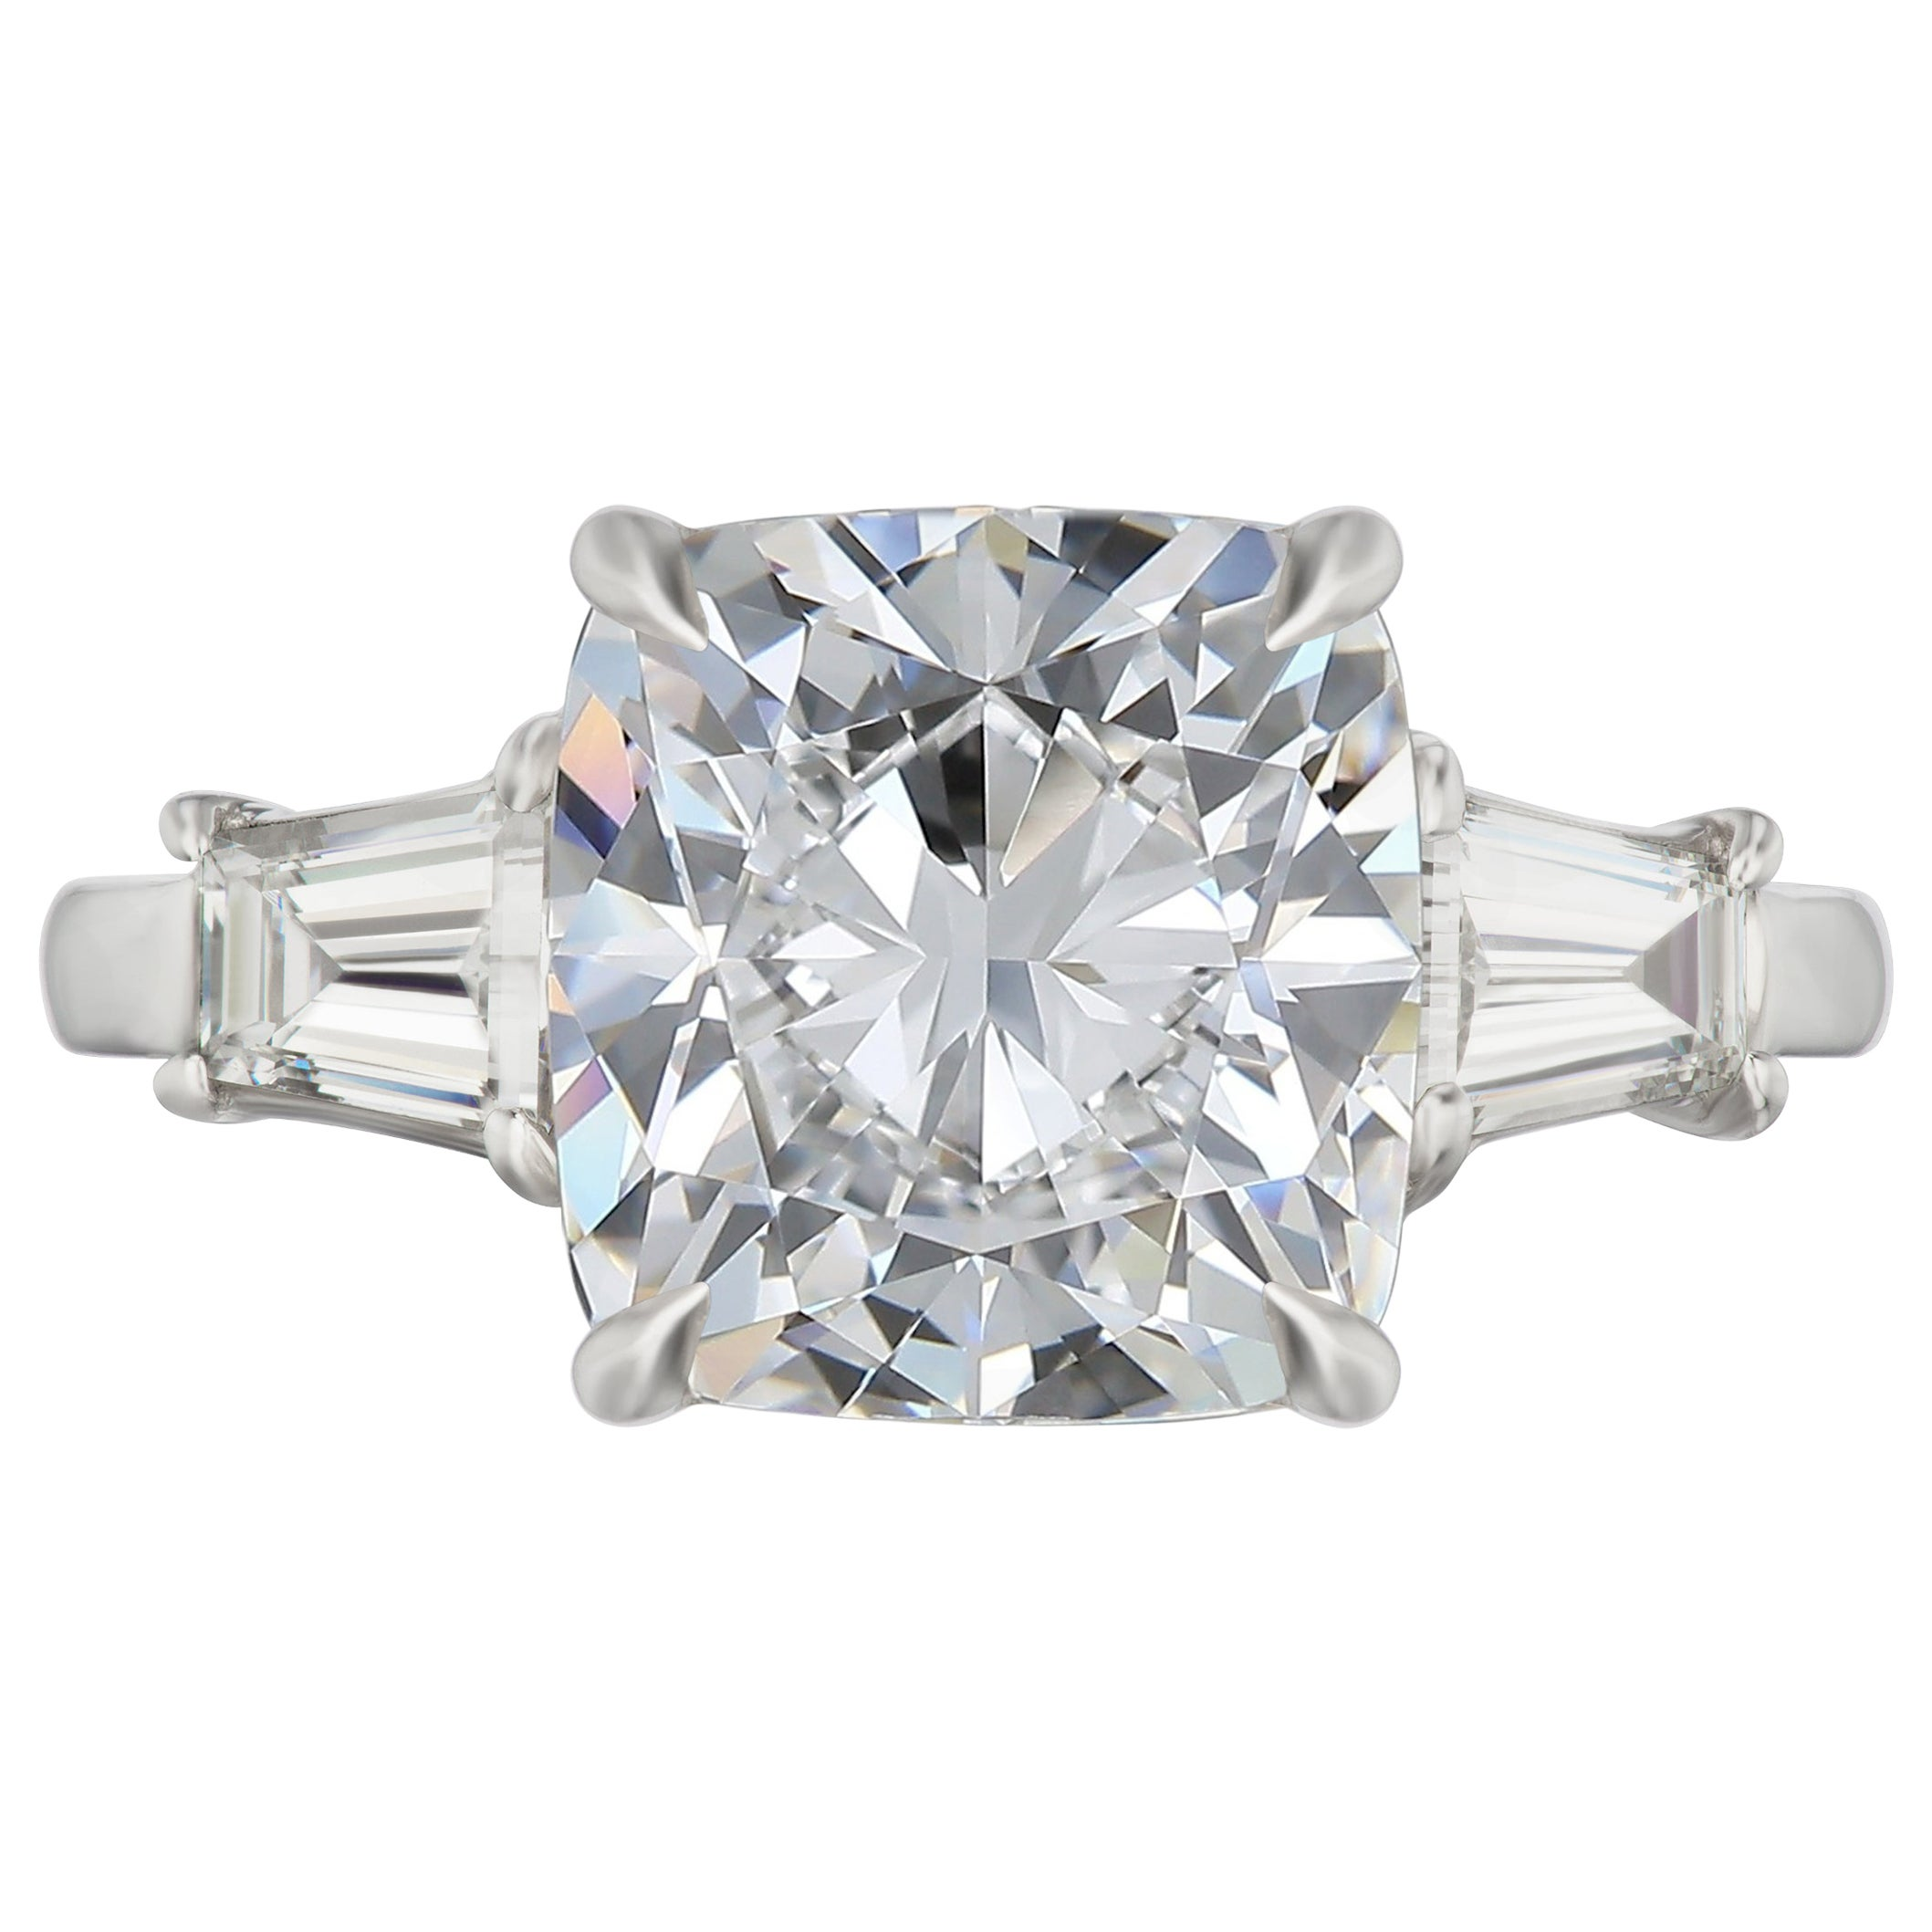 FLAWLESS GIA Certified 3.65 Carat Cushion Modified Brilliant Cut Diamond Ring